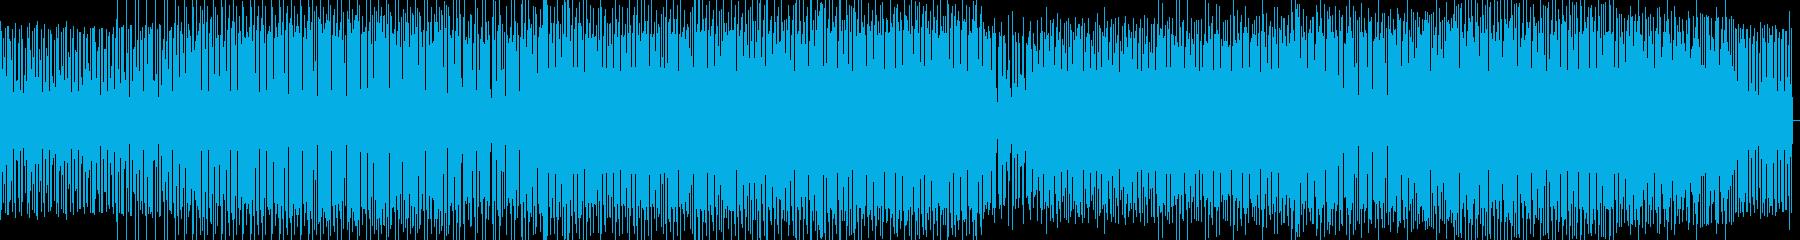 high の再生済みの波形